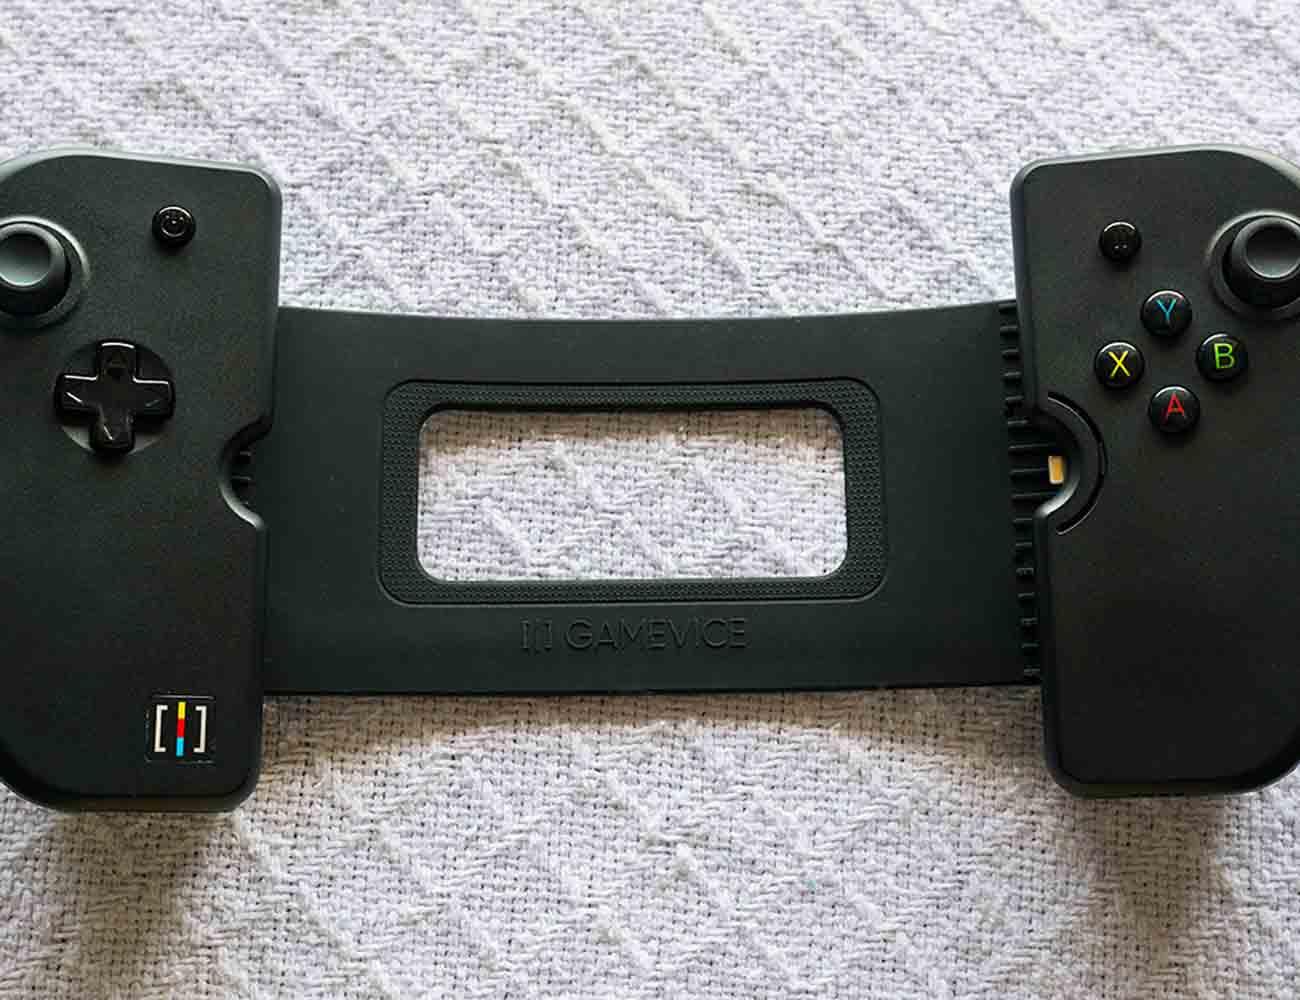 Gamevice Handheld Controller for iPad Mini